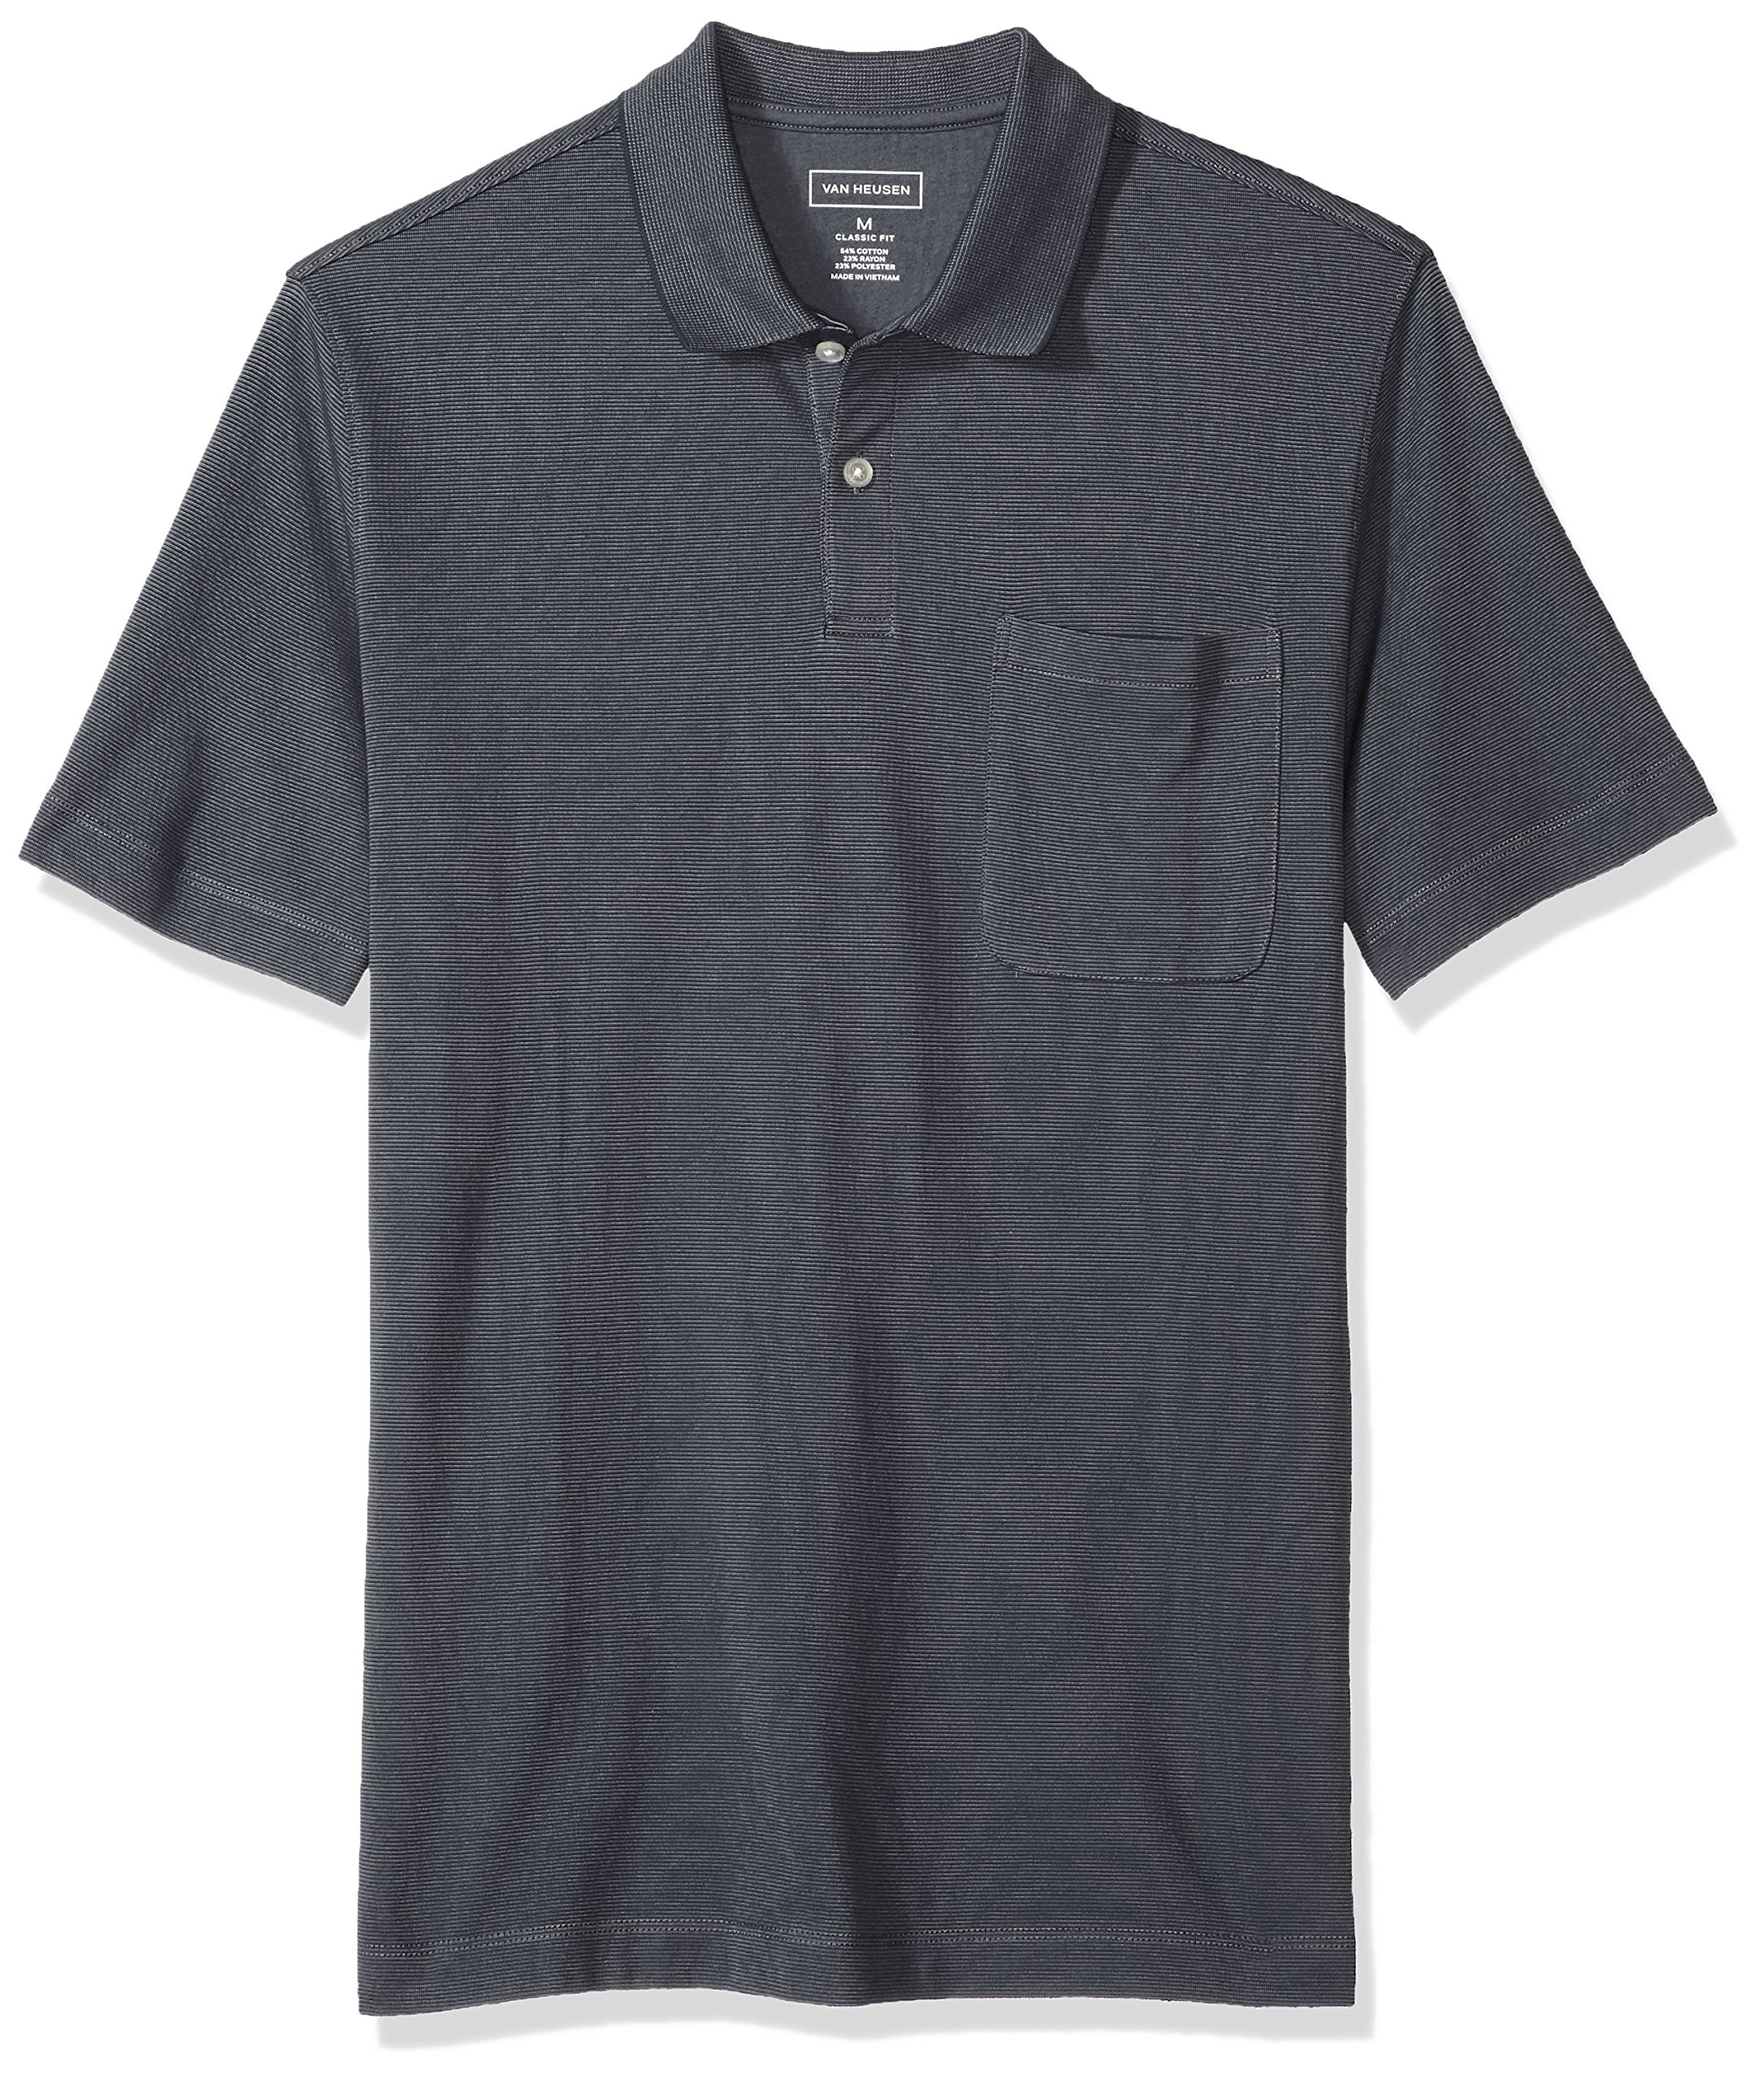 Van Heusen Men's Jacquard Stripe Short Sleeve Polo, Iron Gate, Large